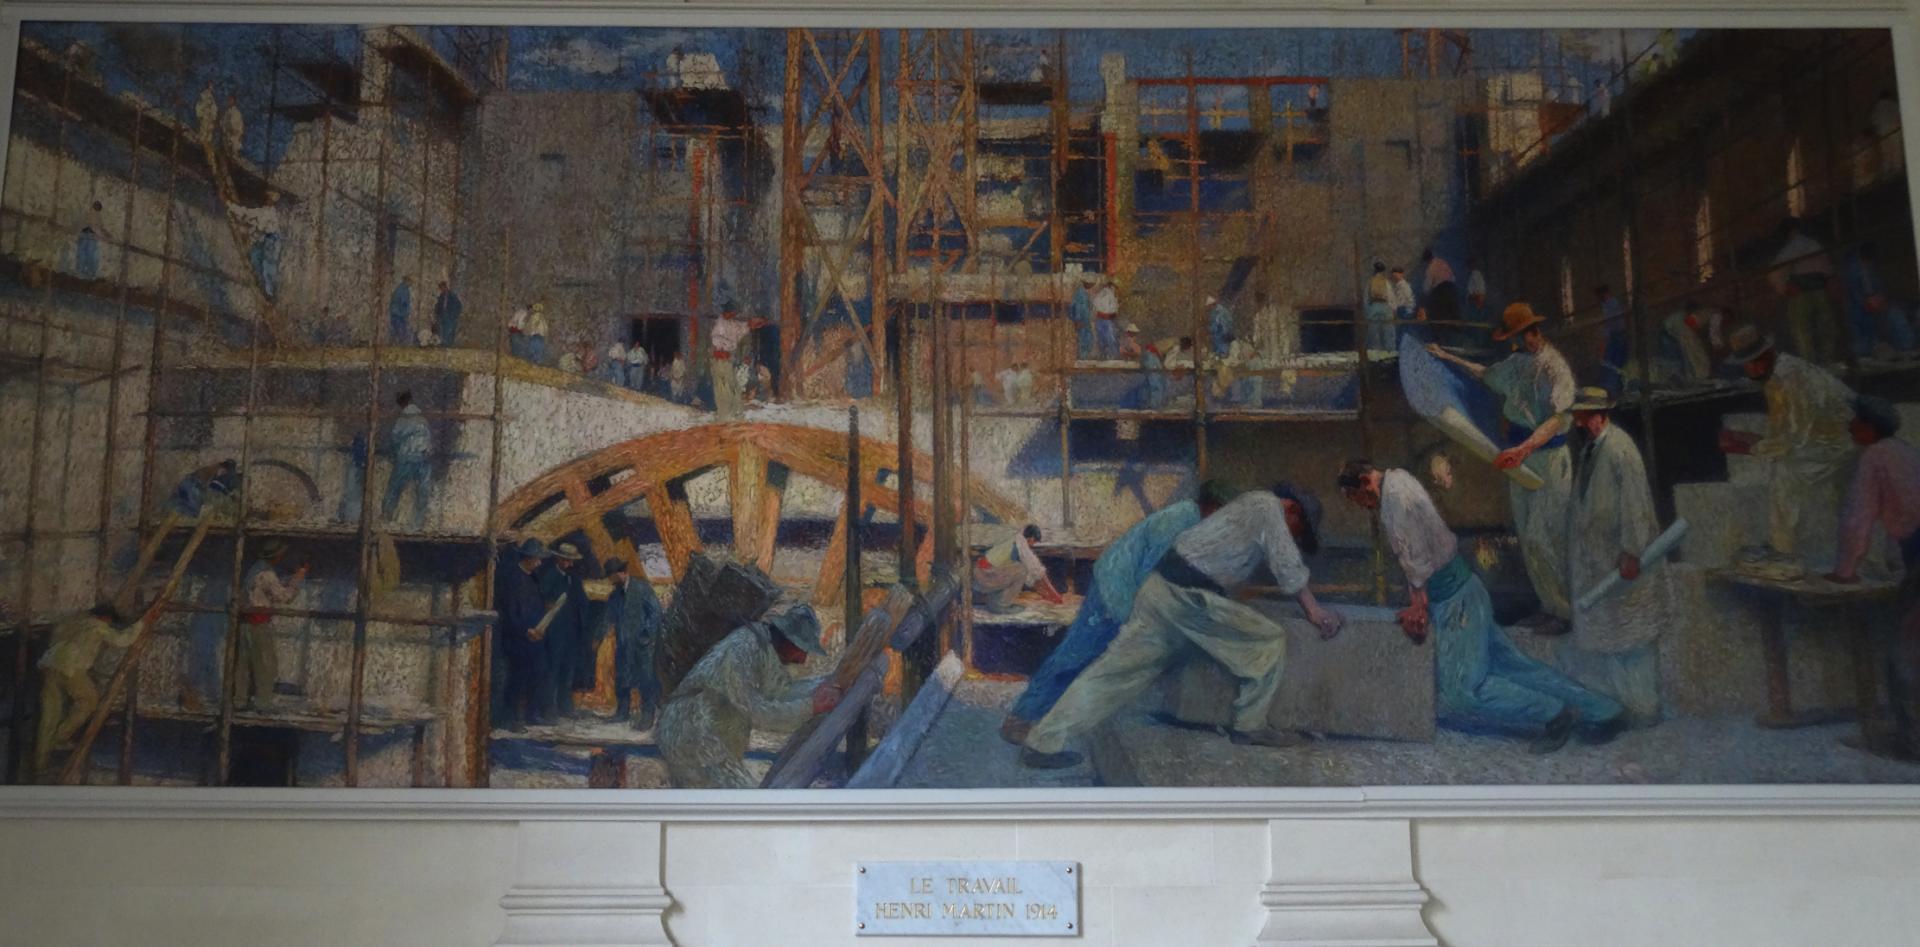 Henri Martin- Le travail